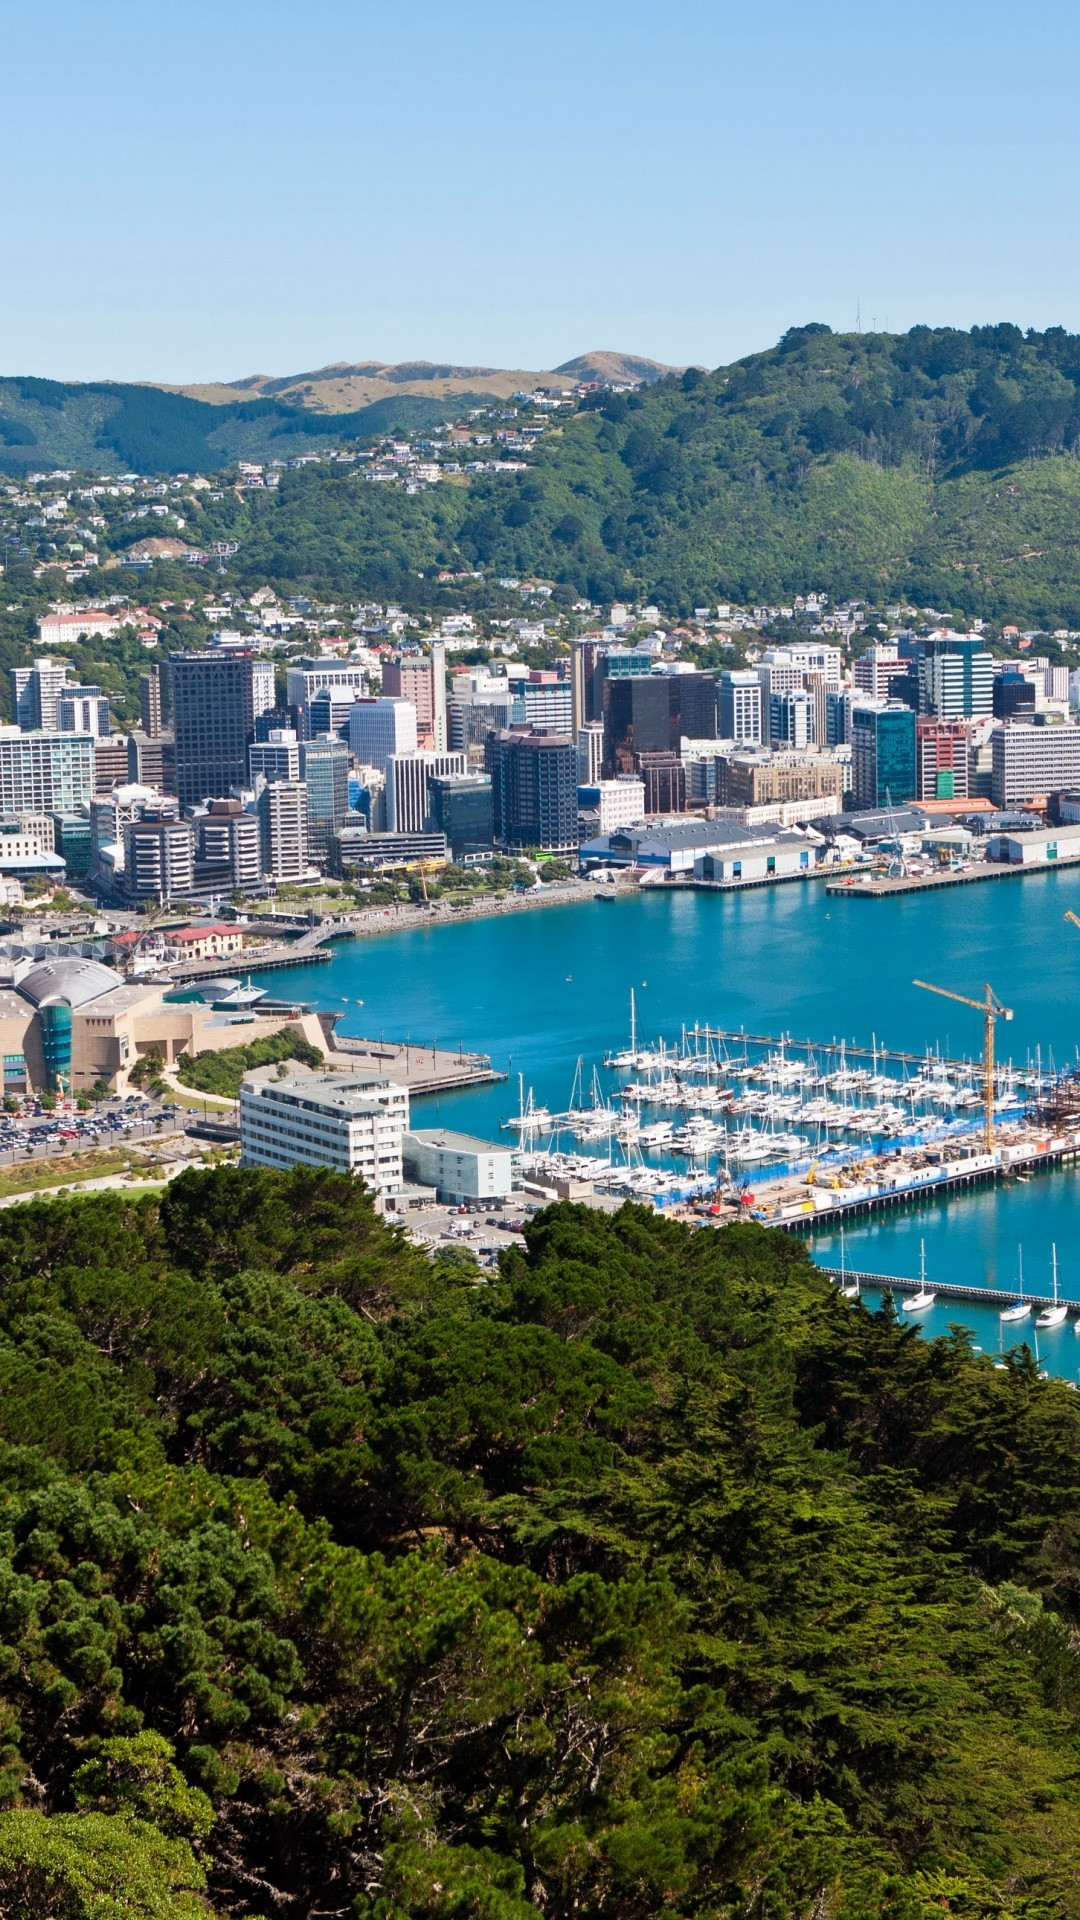 Download 1080x1920 Cityscape New Zealand Wellington Coast 1080x1920